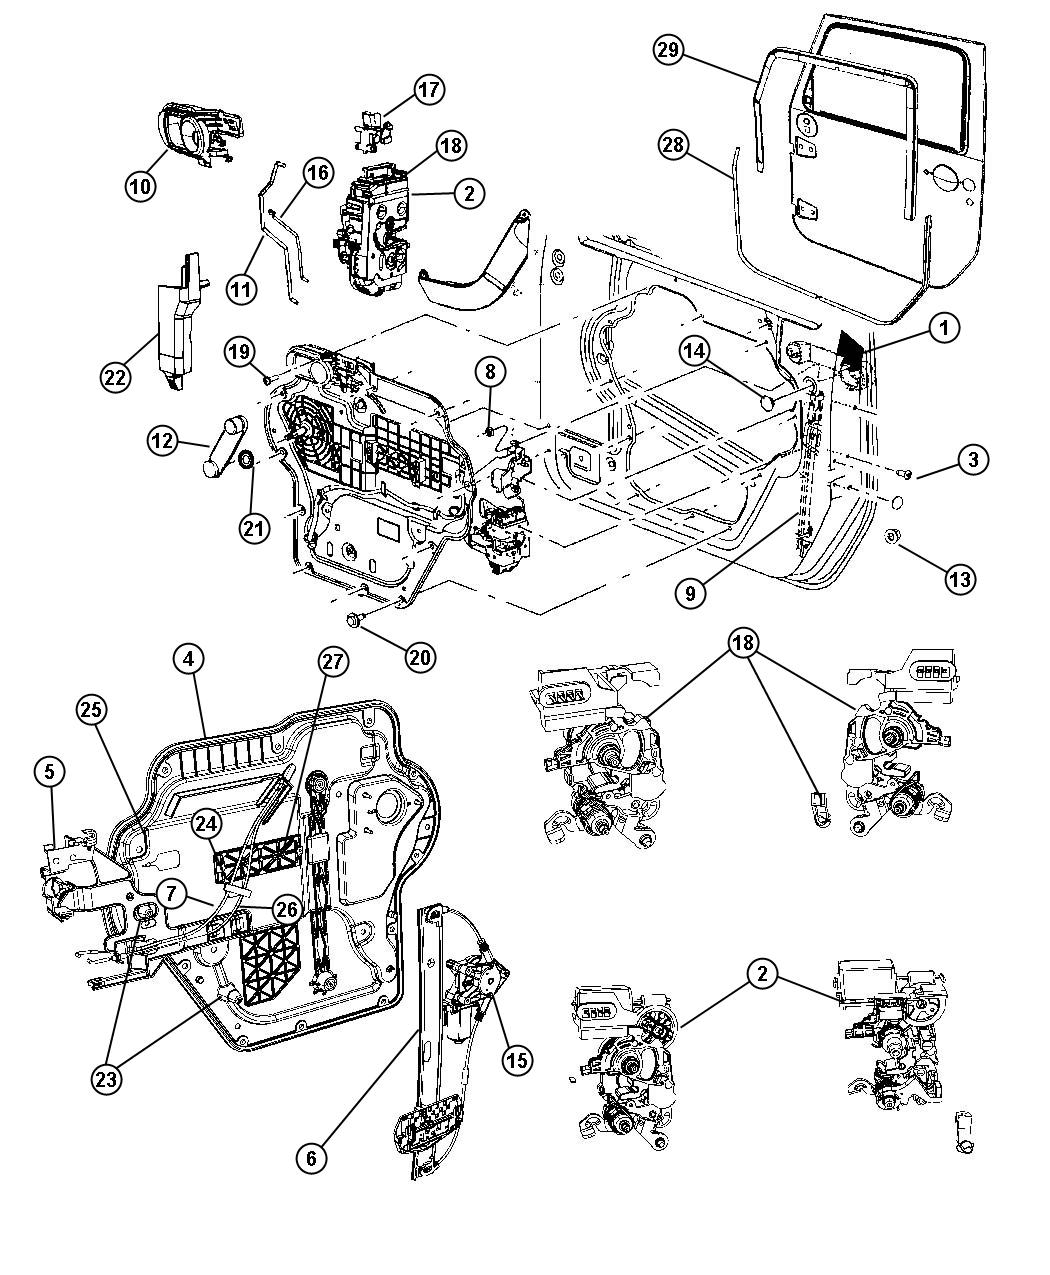 Jeep Wrangler Vehicle Parts